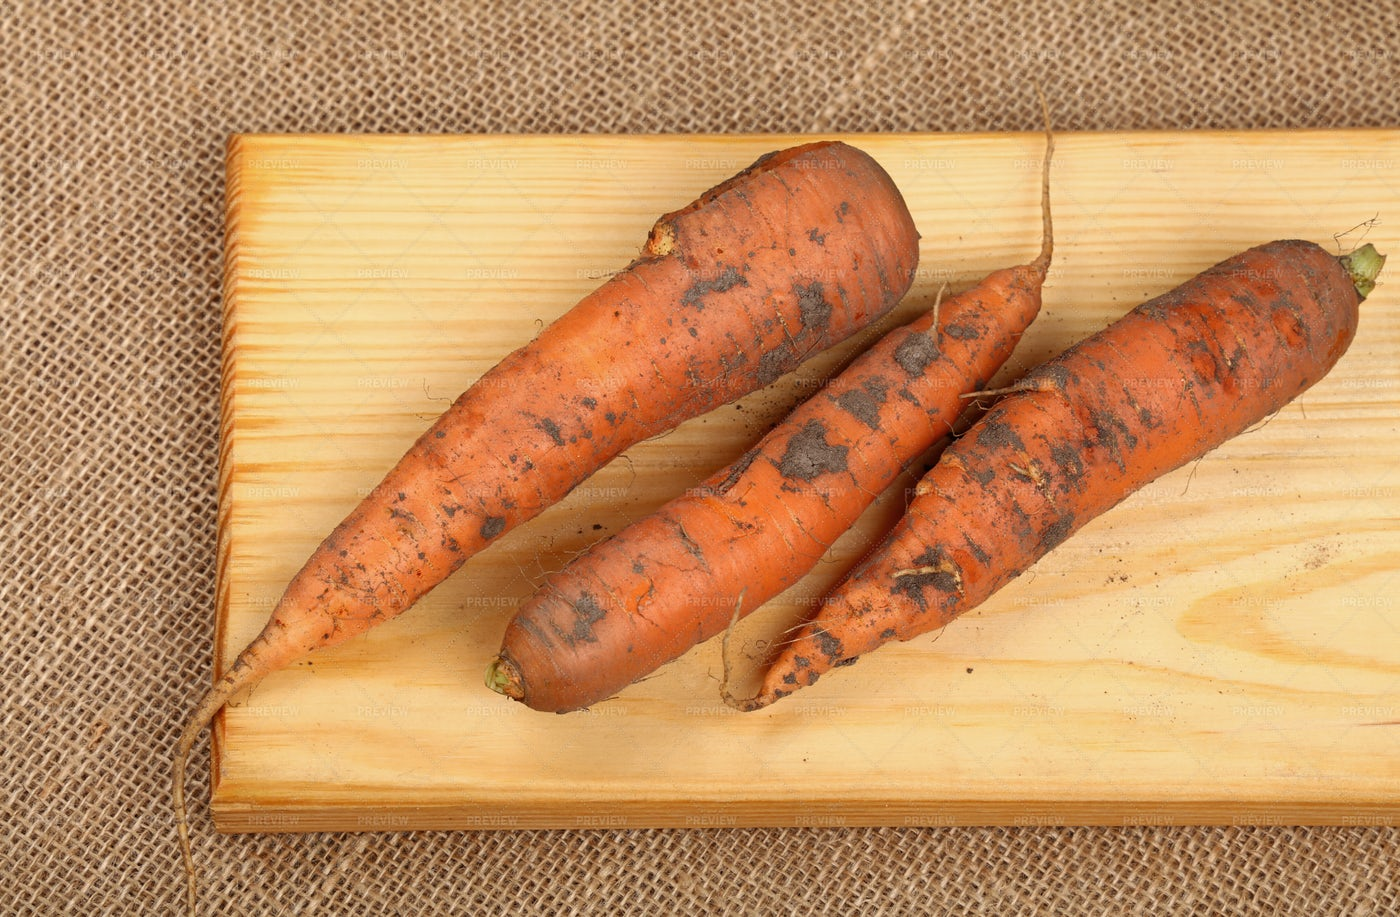 Raw Dirty Carrots: Stock Photos